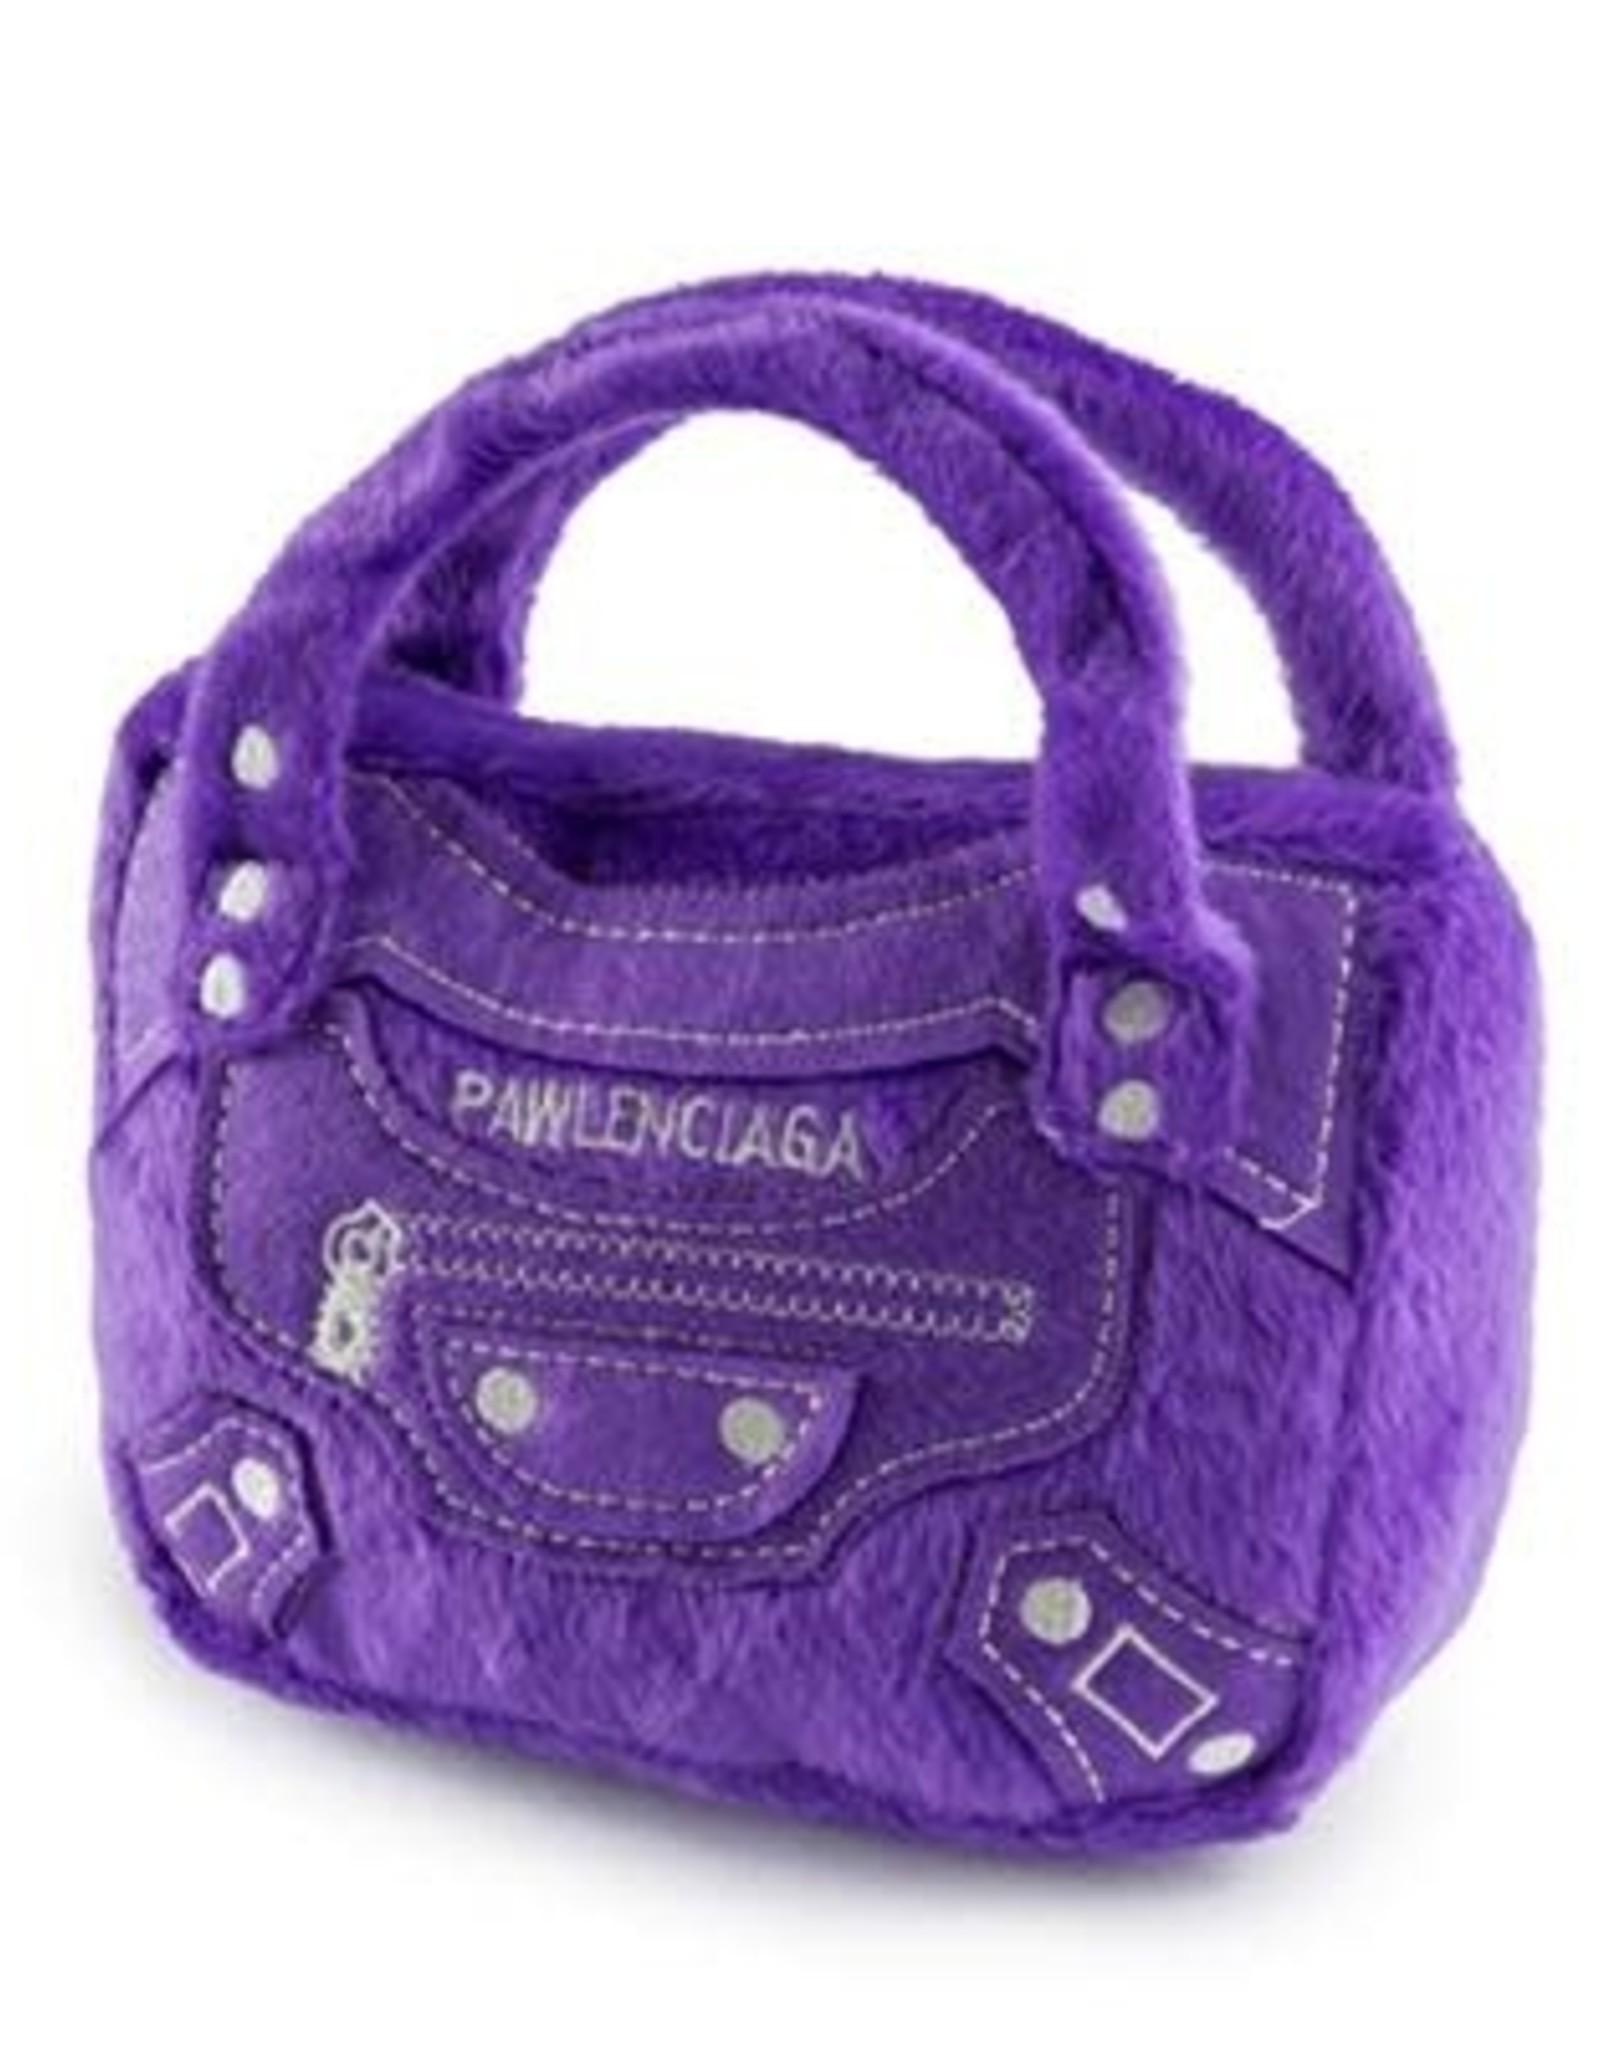 Haute Diggity Dog Haute Diggity Dog Pawlenciaga Bag